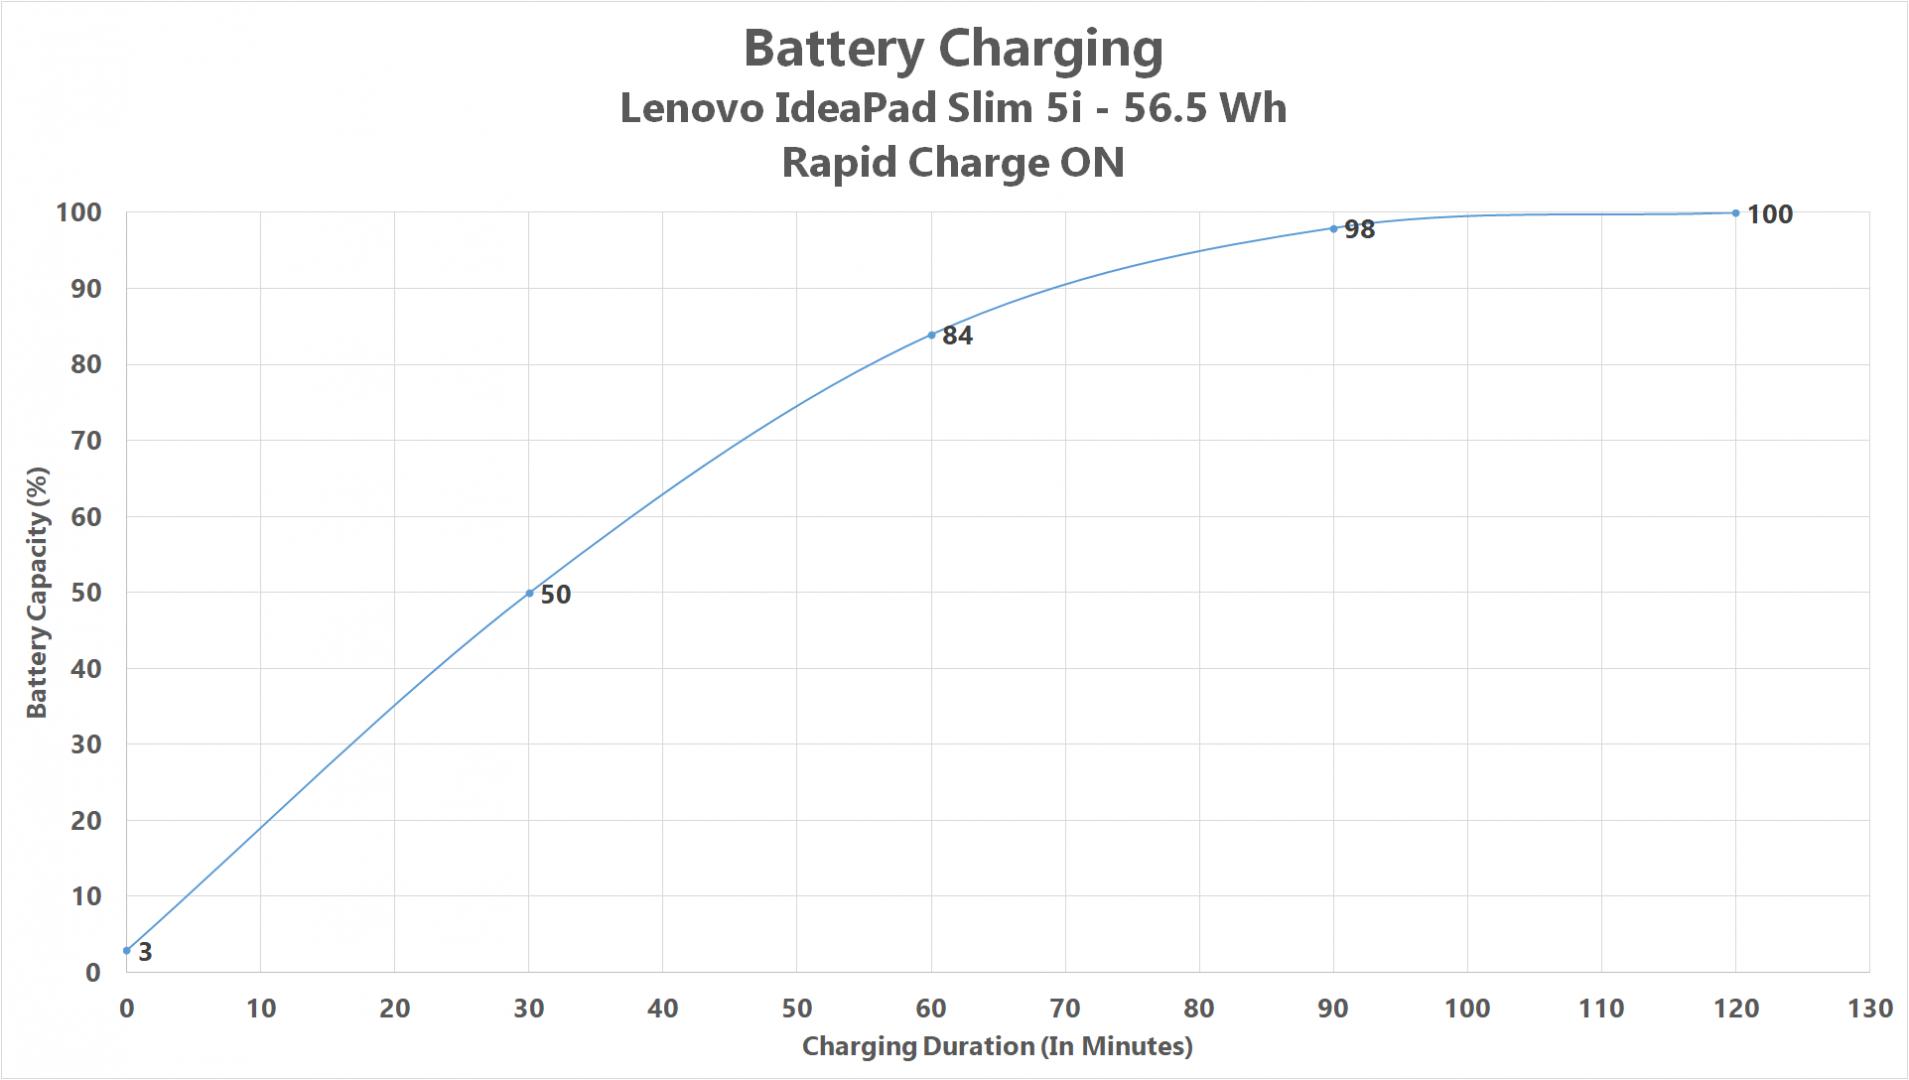 charging rapid on